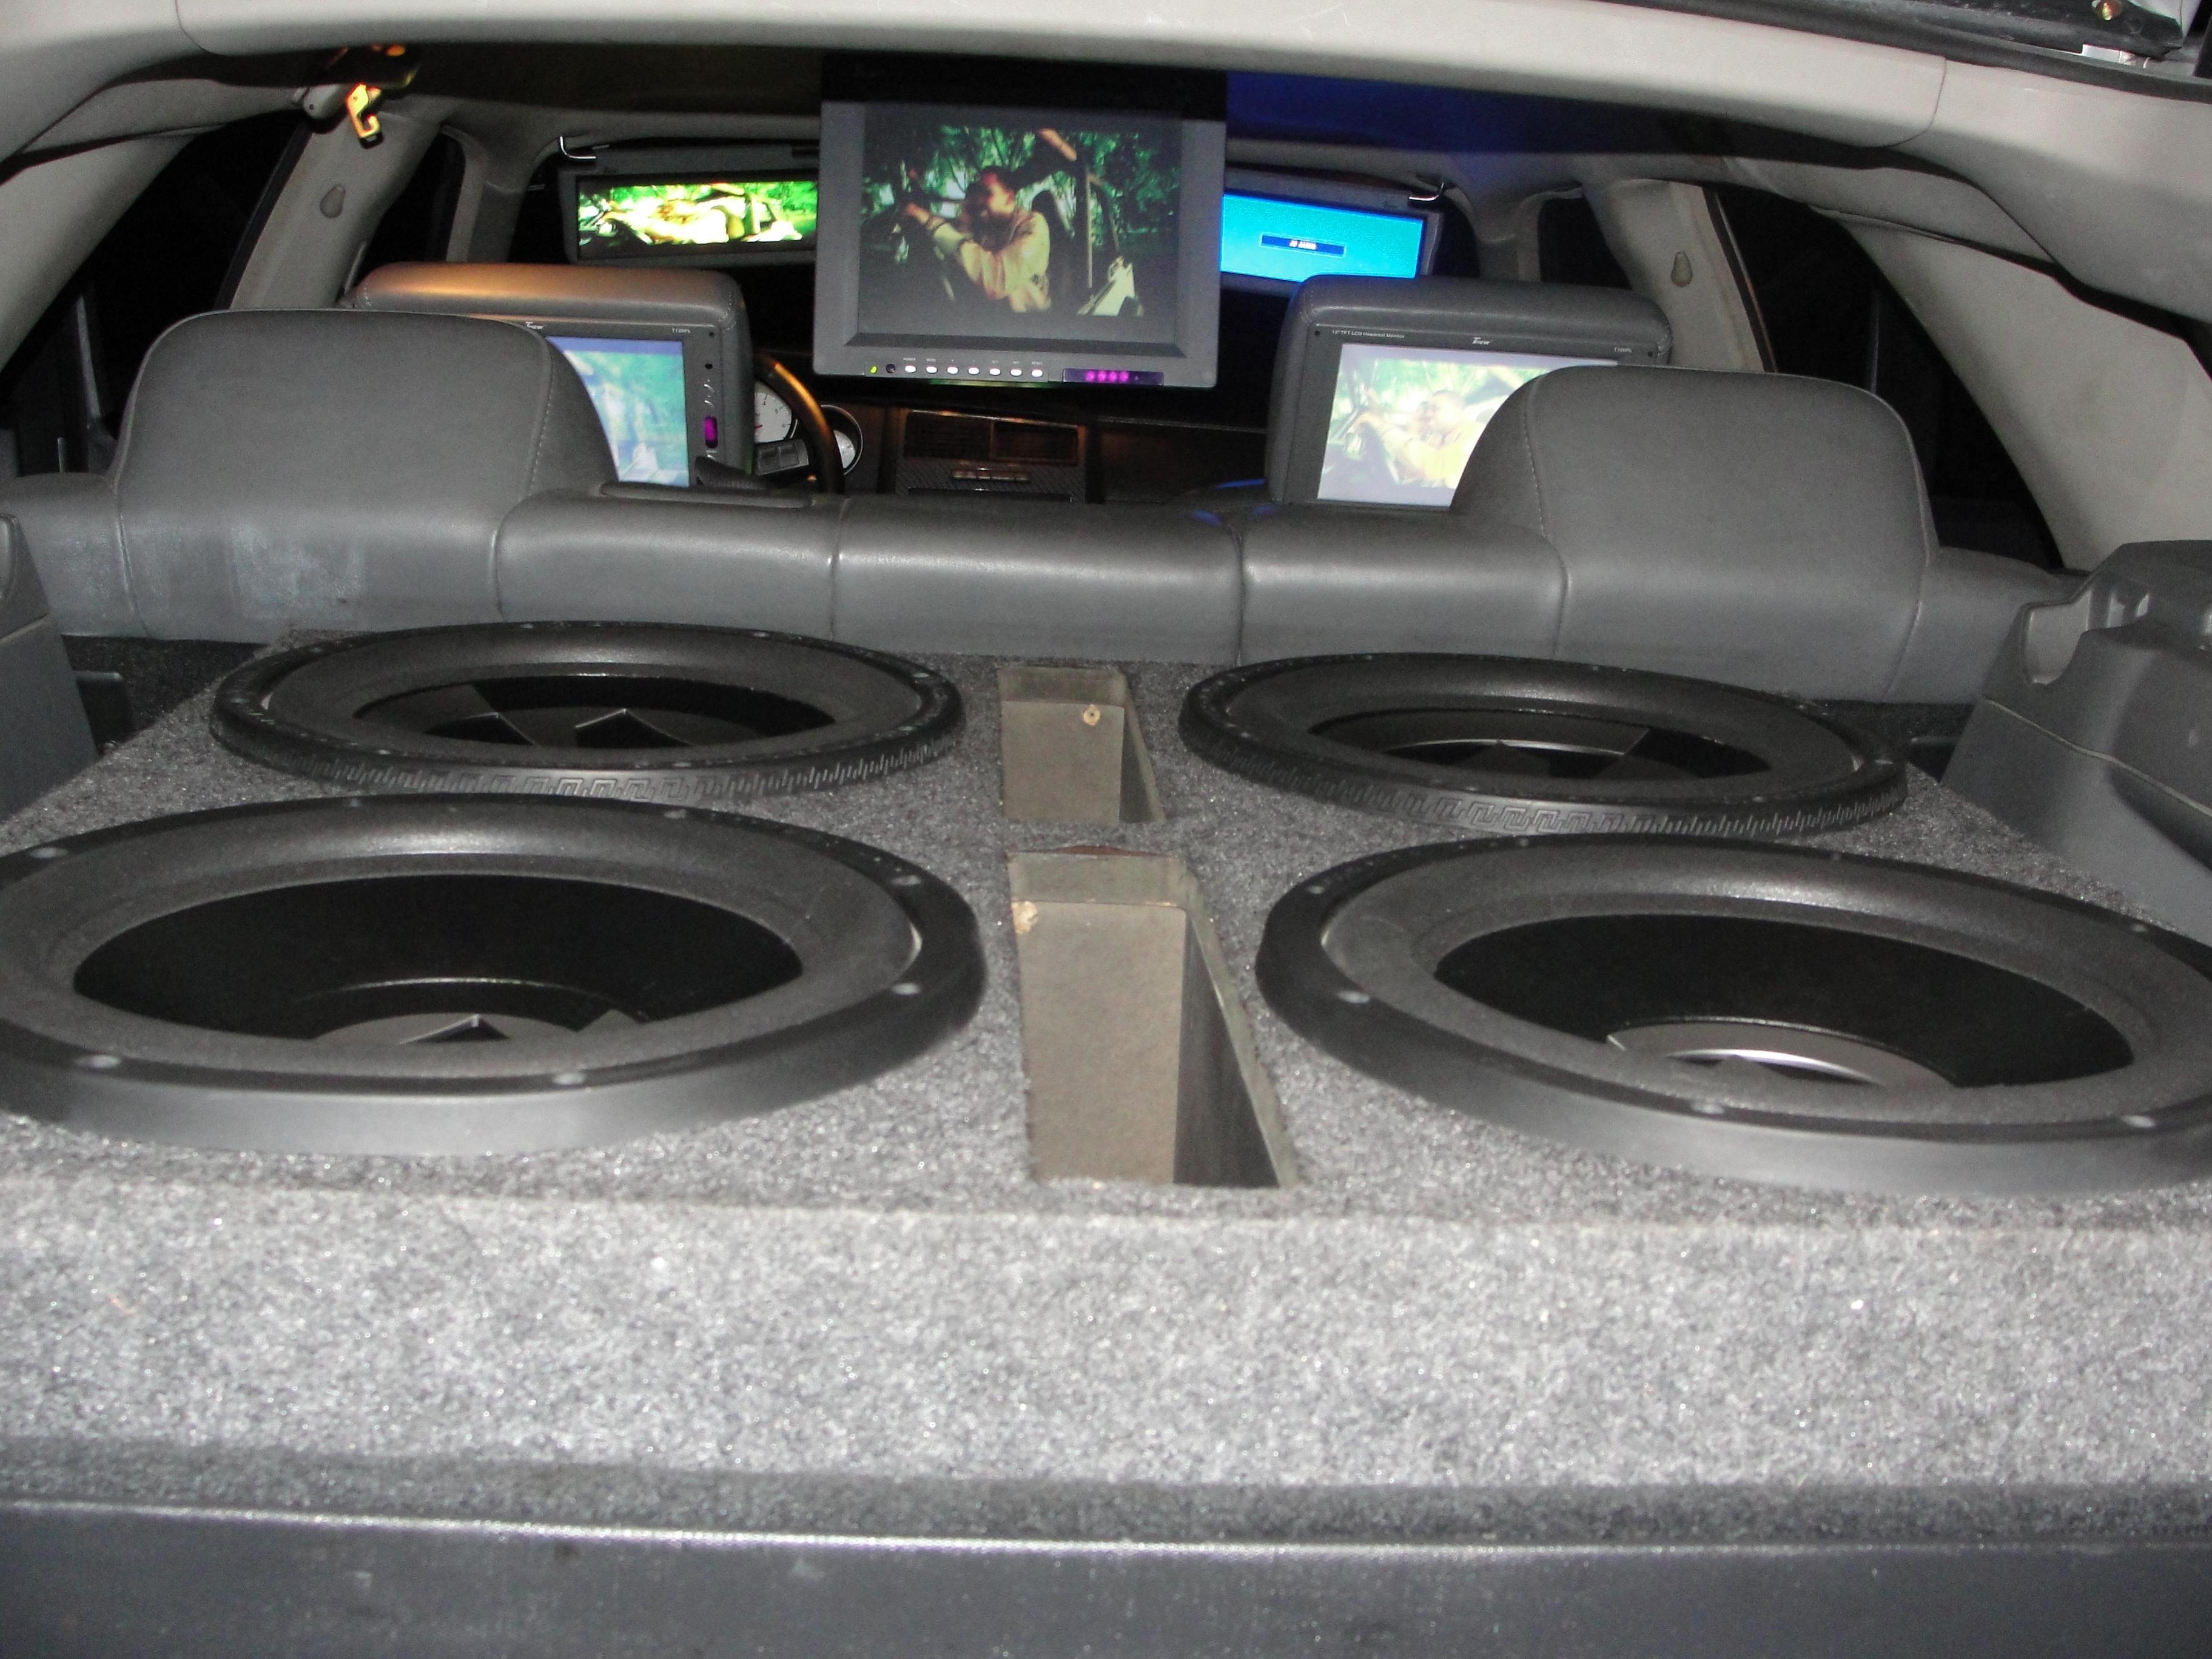 4 12 memphis audio subwoofer enclosure for 2005 dodge magnum rt 4 12 memphis audio subwoofer enclosure for 2005 dodge magnum rt dsc00487 altavistaventures Choice Image